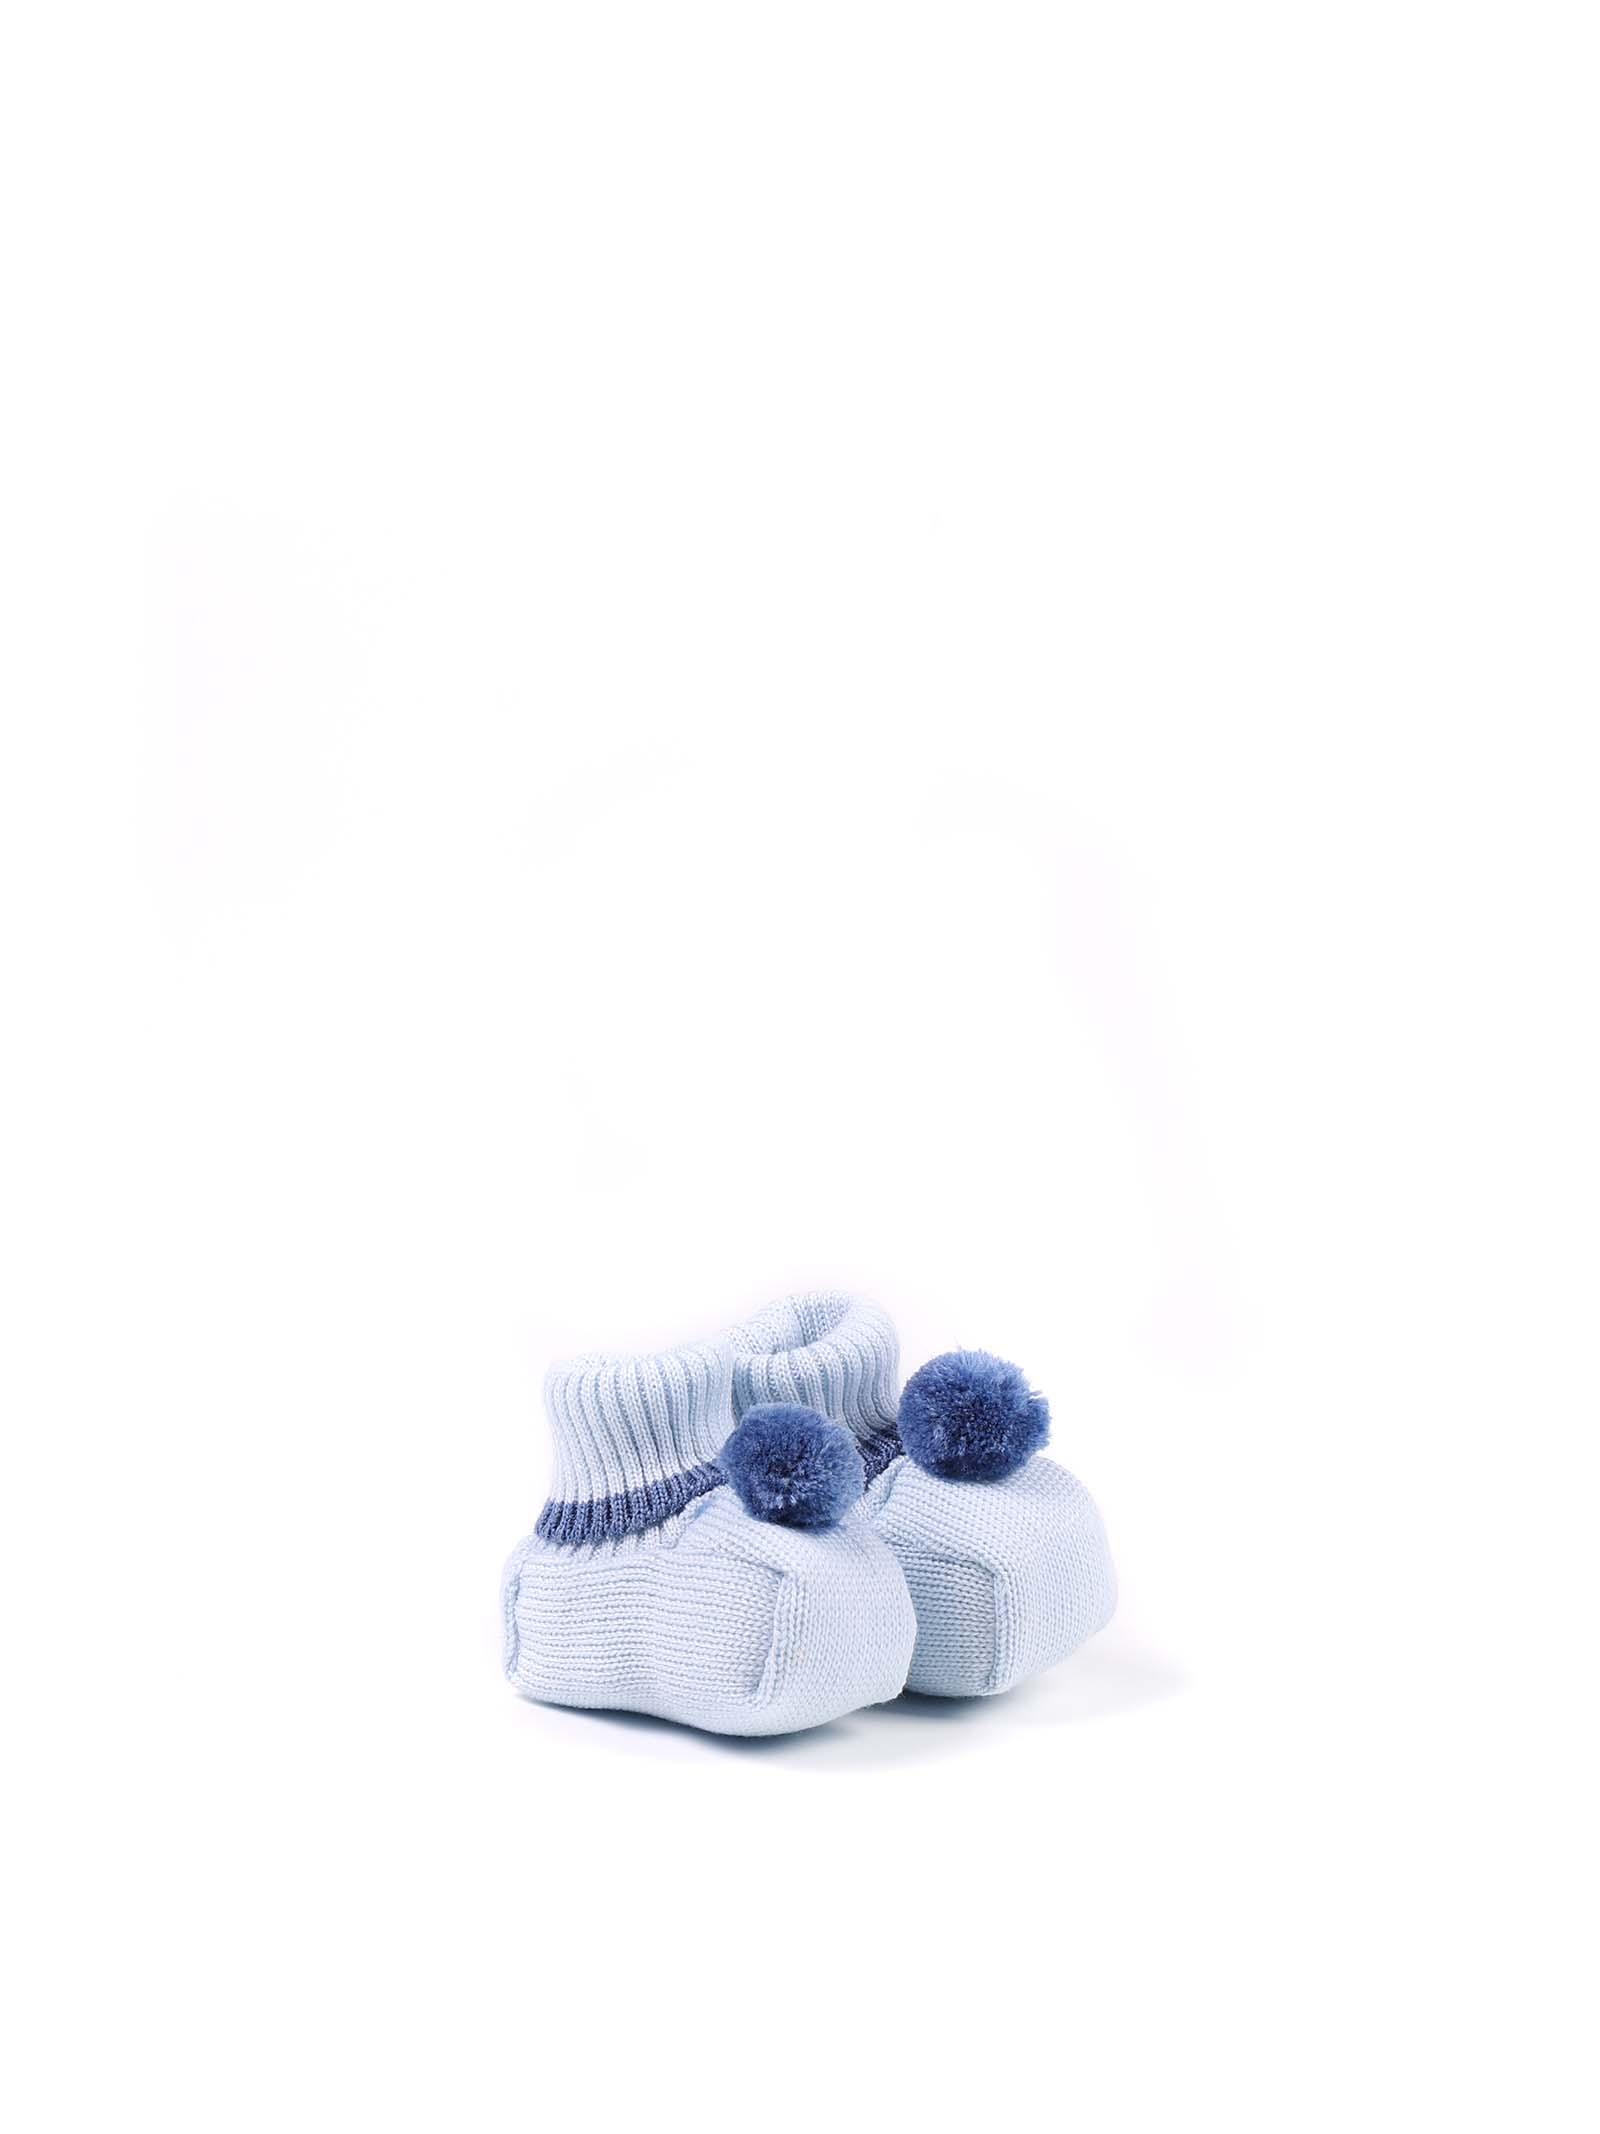 scarpina baby celeste con bordino blu MARLU   Scarpina   IP60SC412